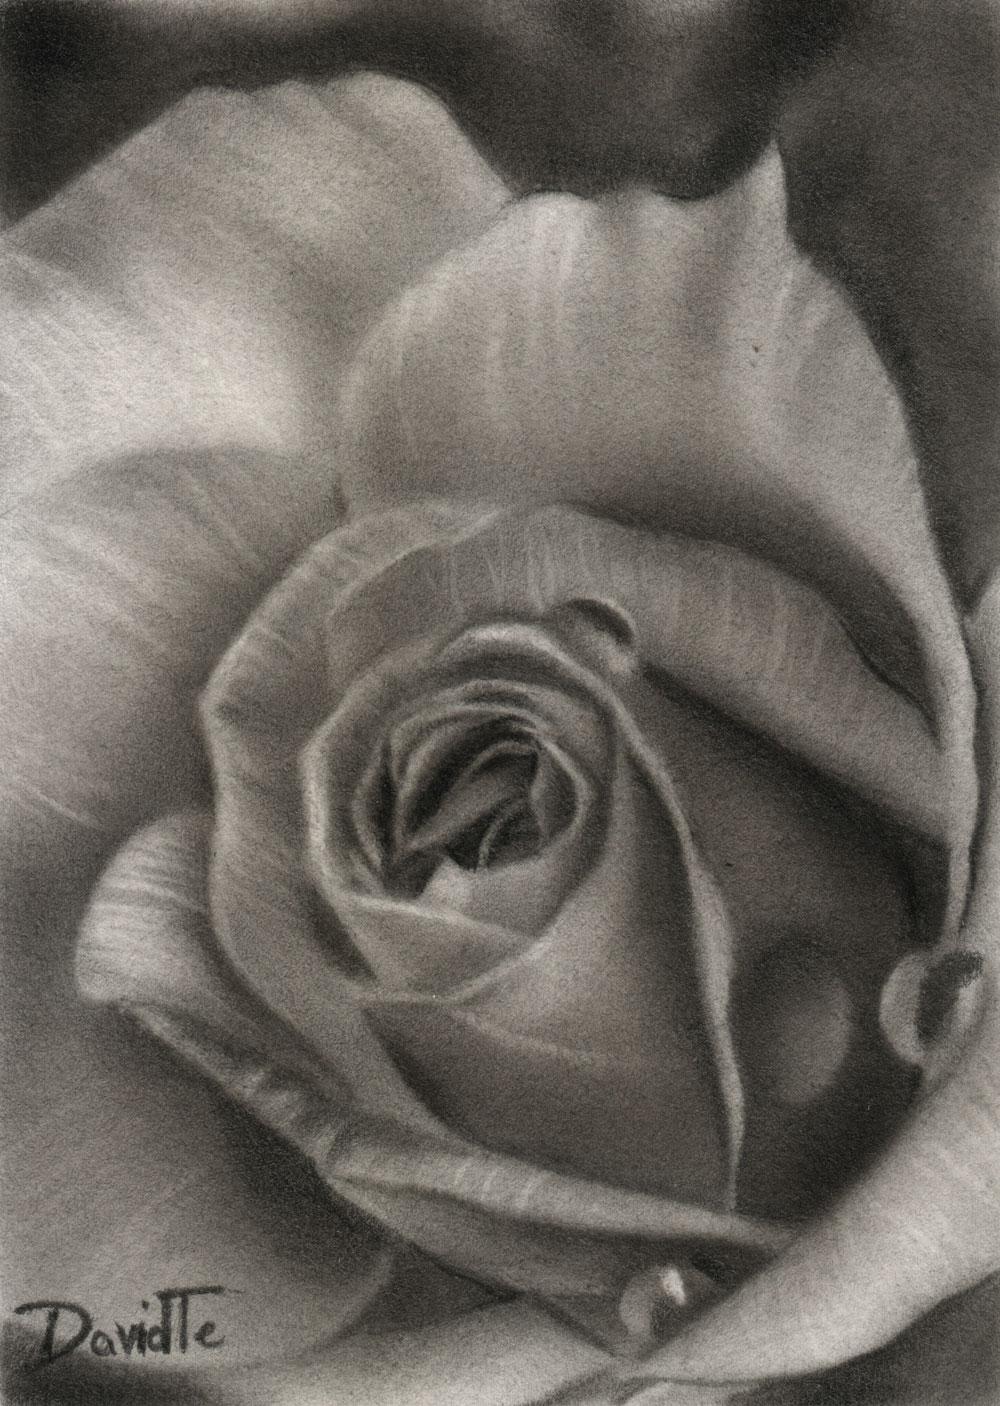 Pencil Drawings by David Te: December 2011